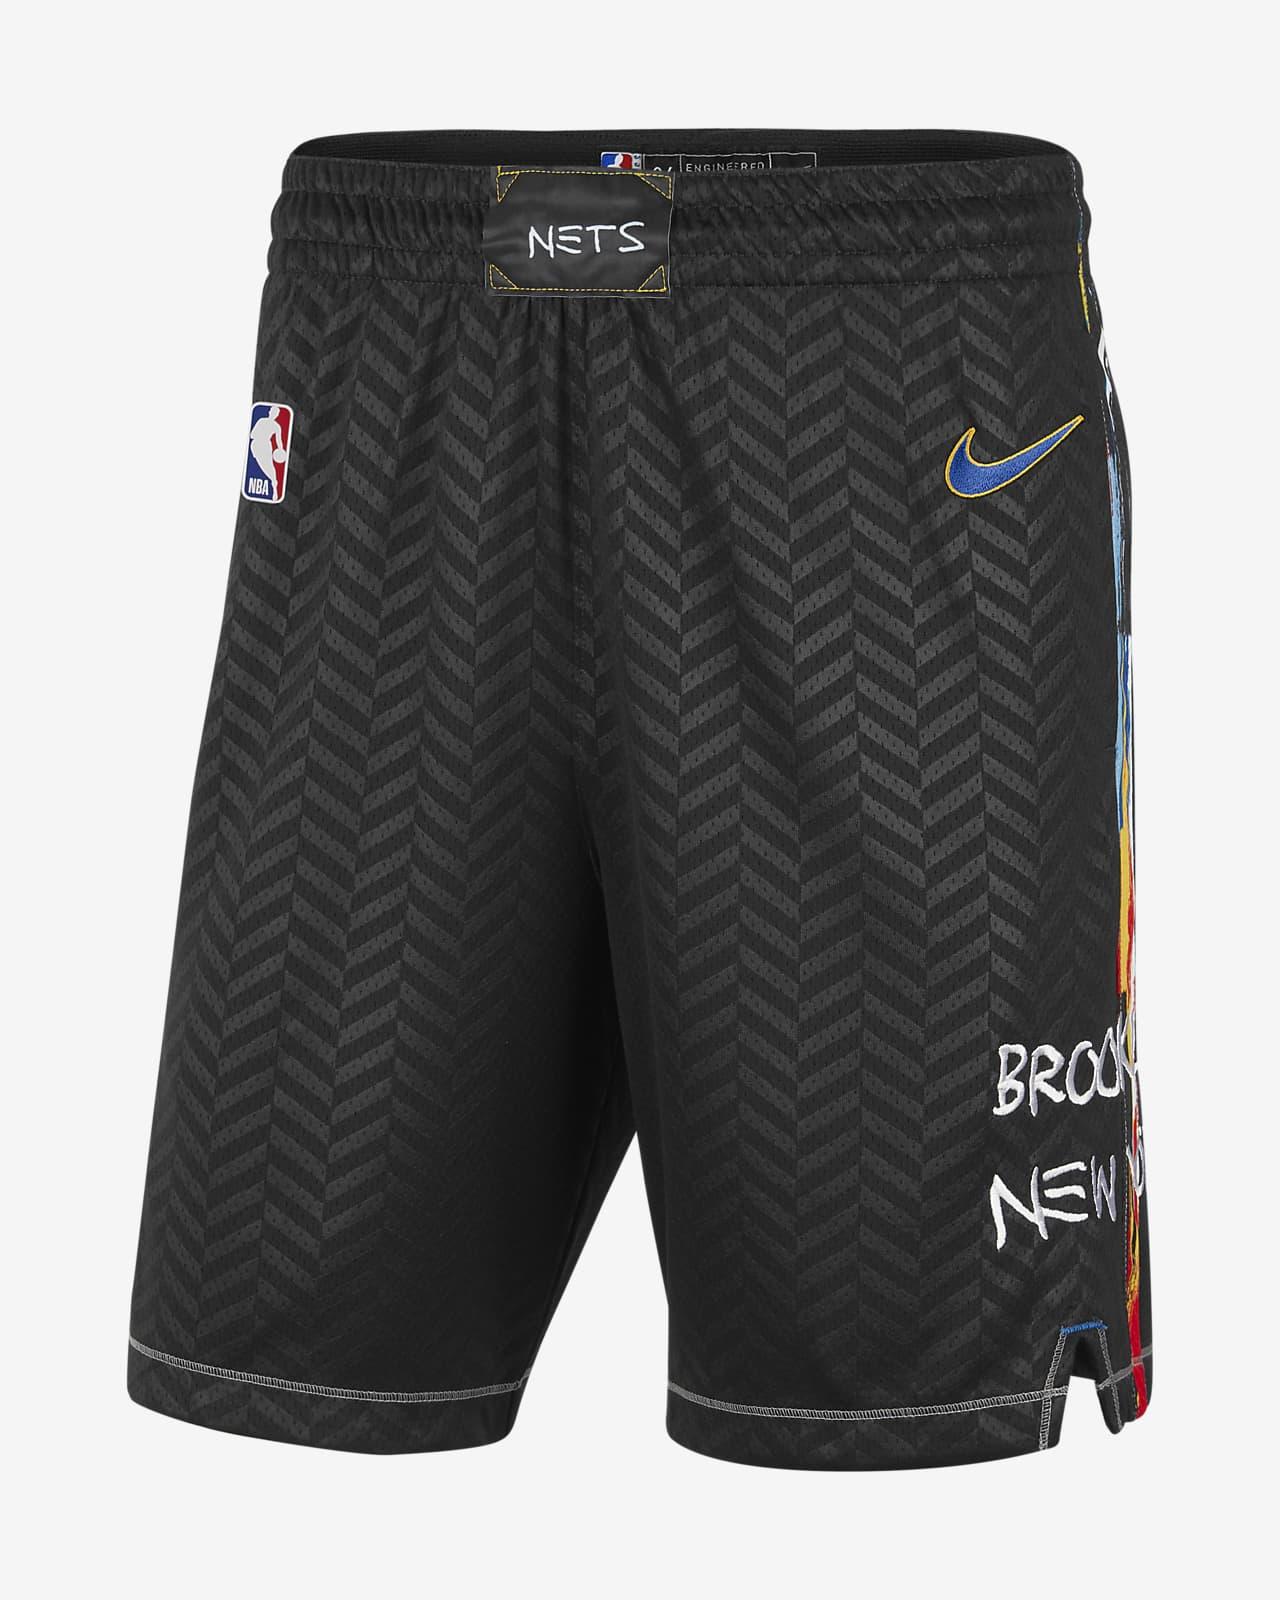 Brooklyn Nets City Edition 2020 Men's Nike NBA Swingman Shorts